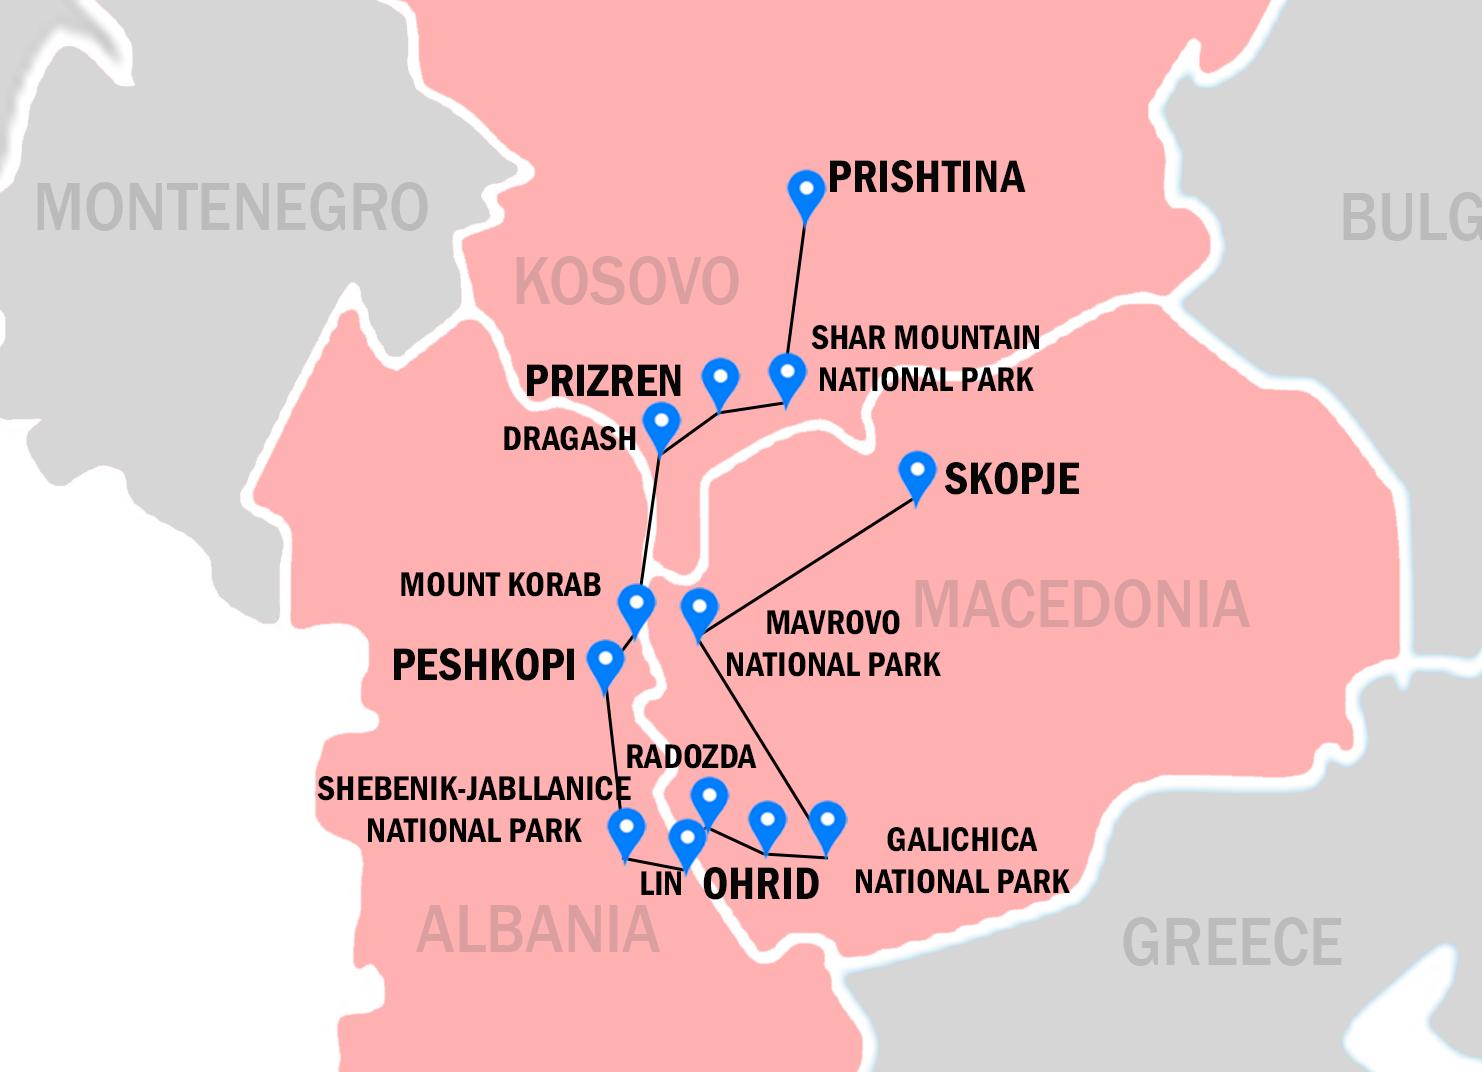 mto-kosovo-albania-macedonia